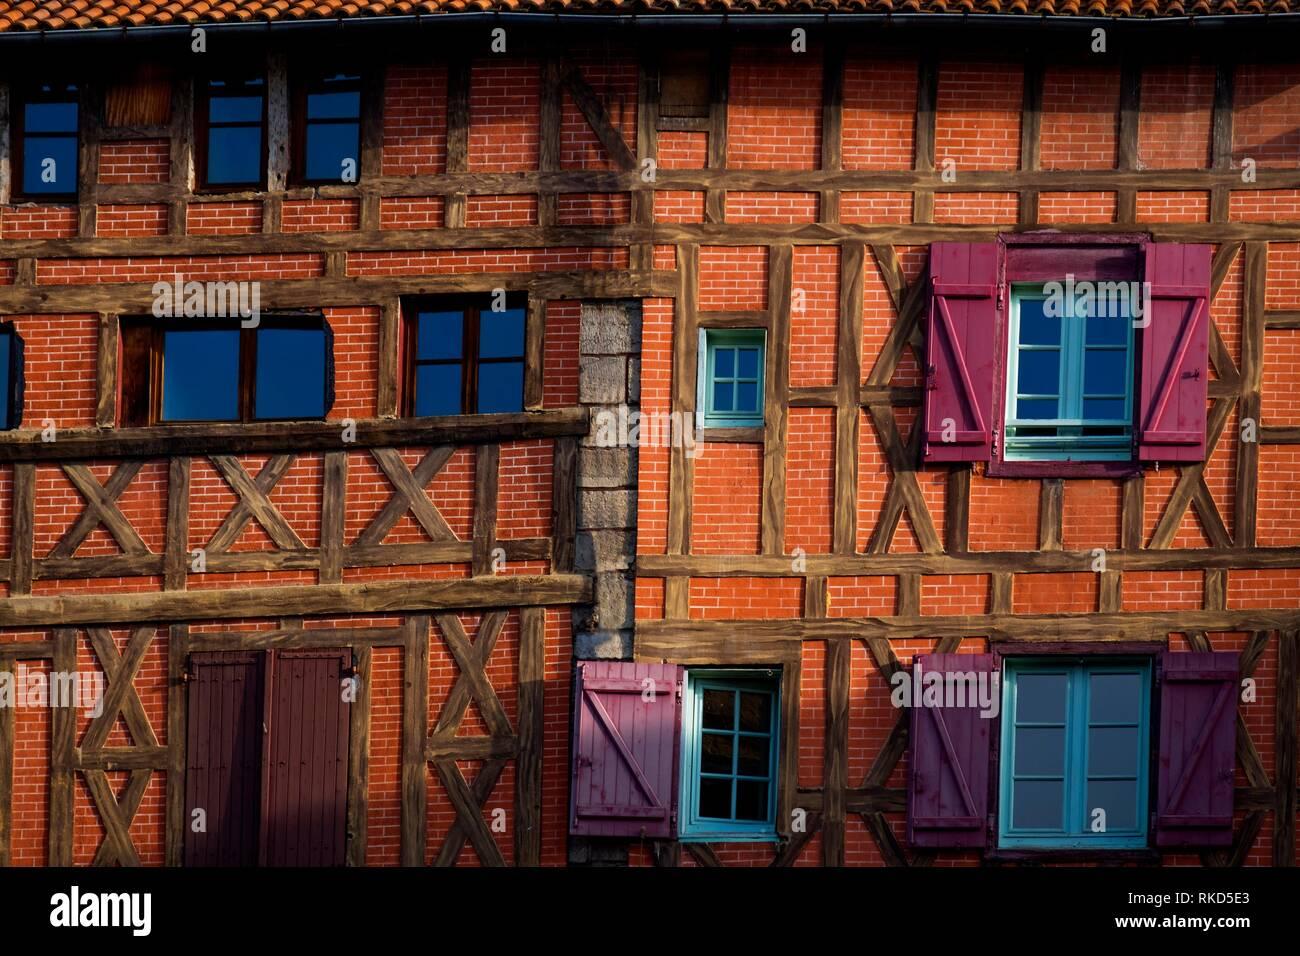 France, Occitanie, Lot, at Figeac. Pilgrimage way to Santiago de Compostela. - Stock Image